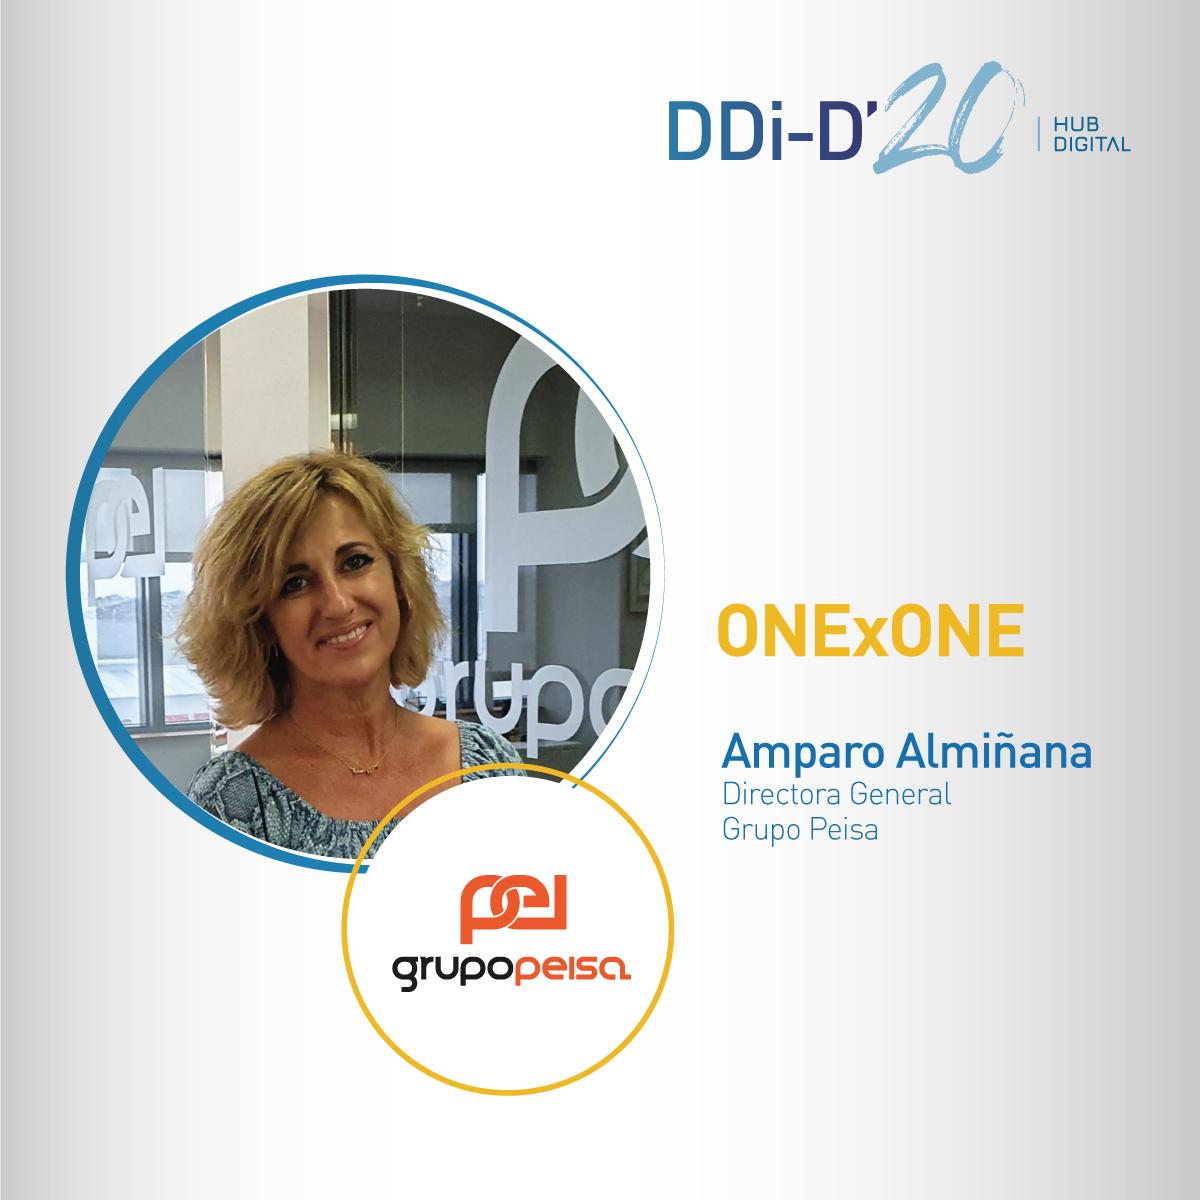 Entrevista Amparo Almiñana, directora general Grupo Peisa